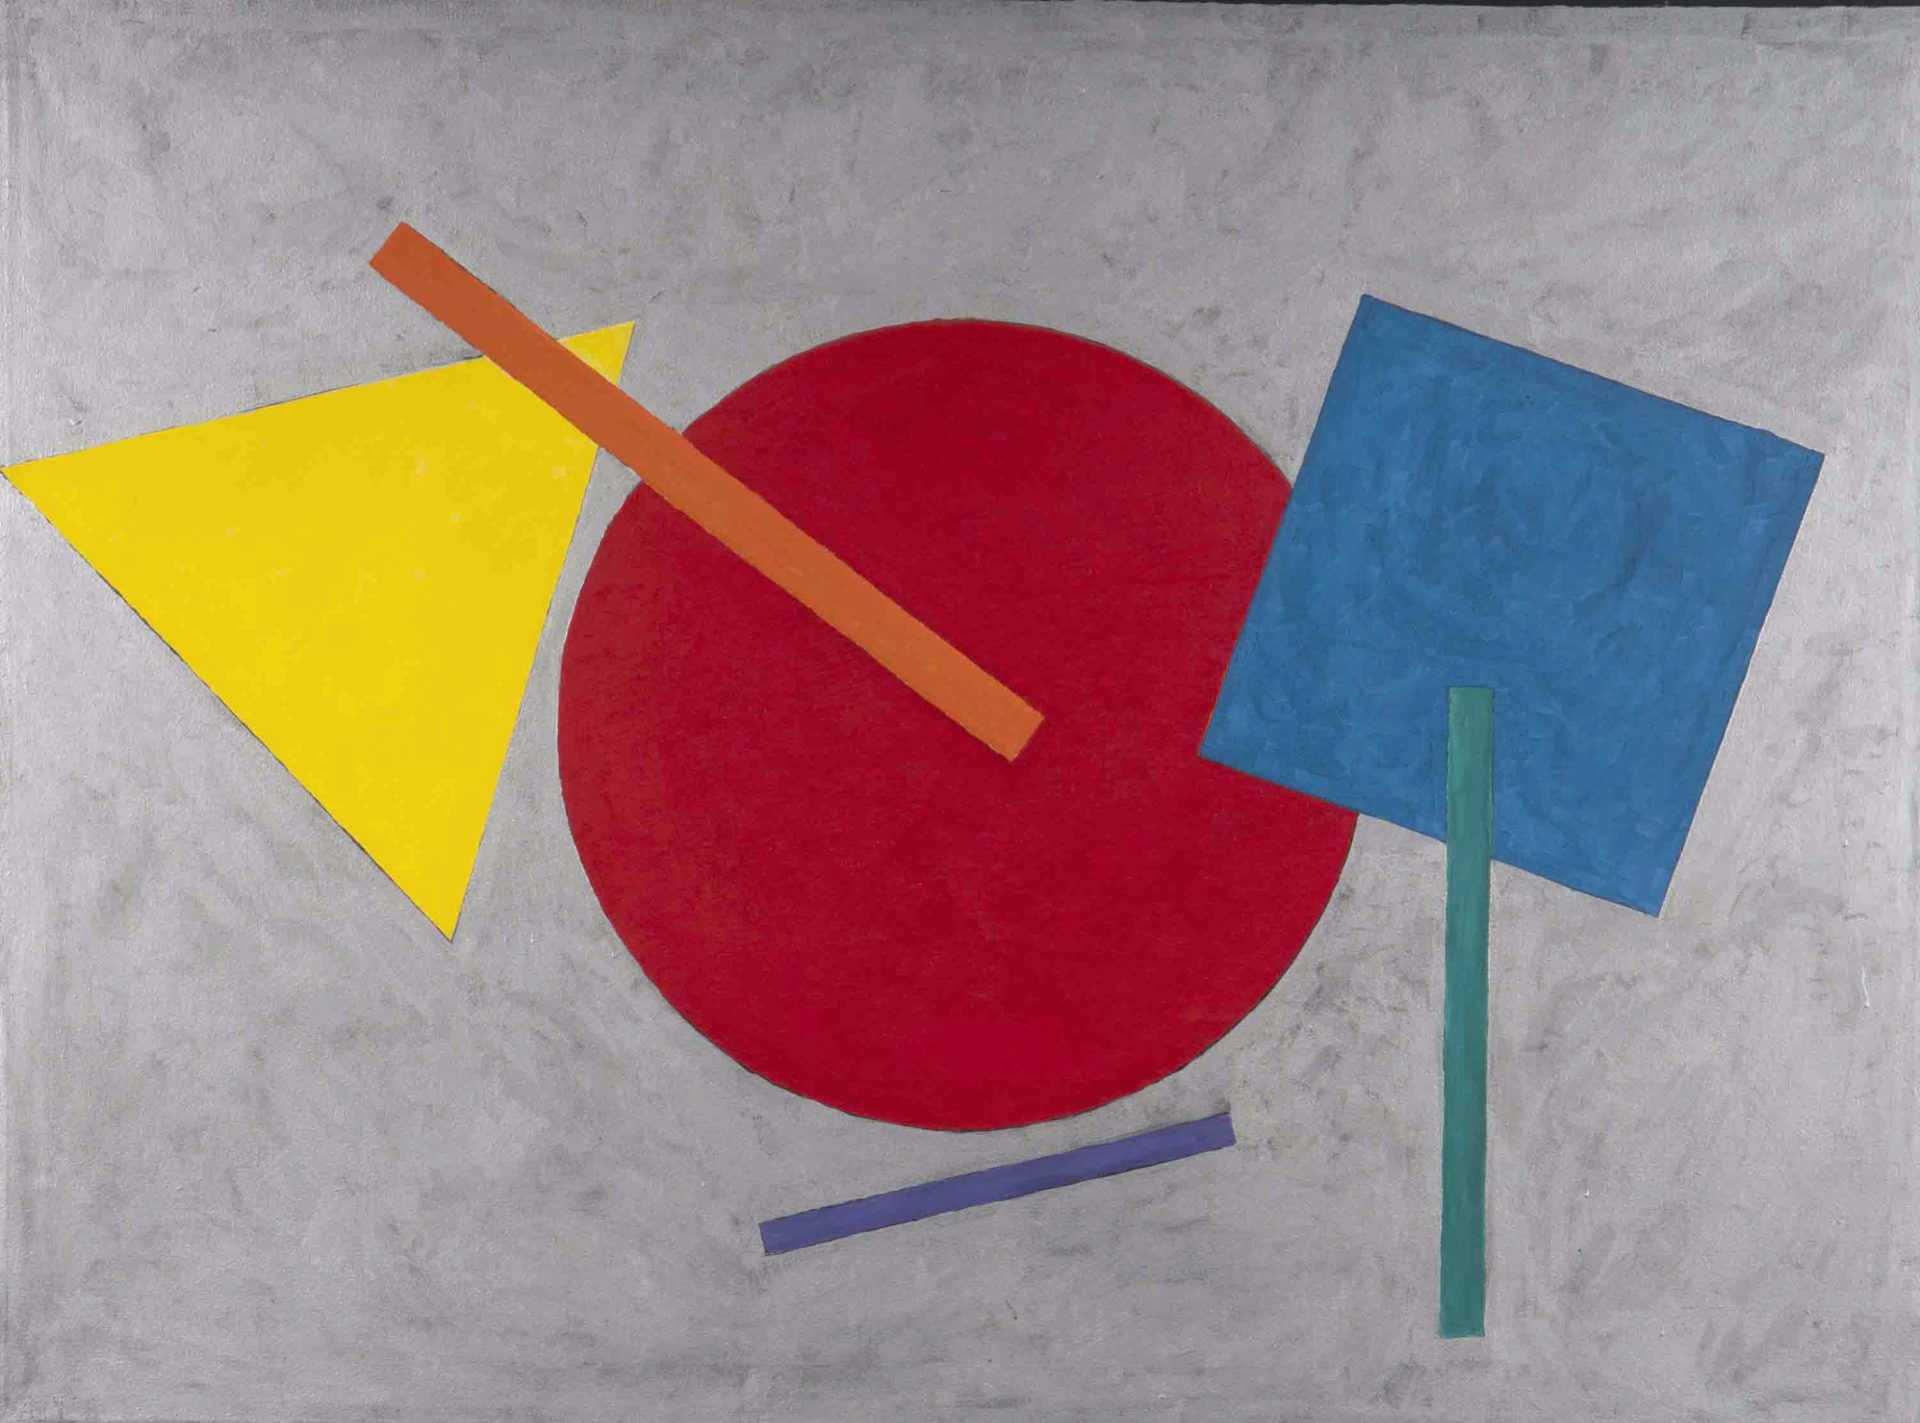 Gunter Christmann, 'Attis', 1975, acrylic on canvas, Gift of Chandler Coventry 1979